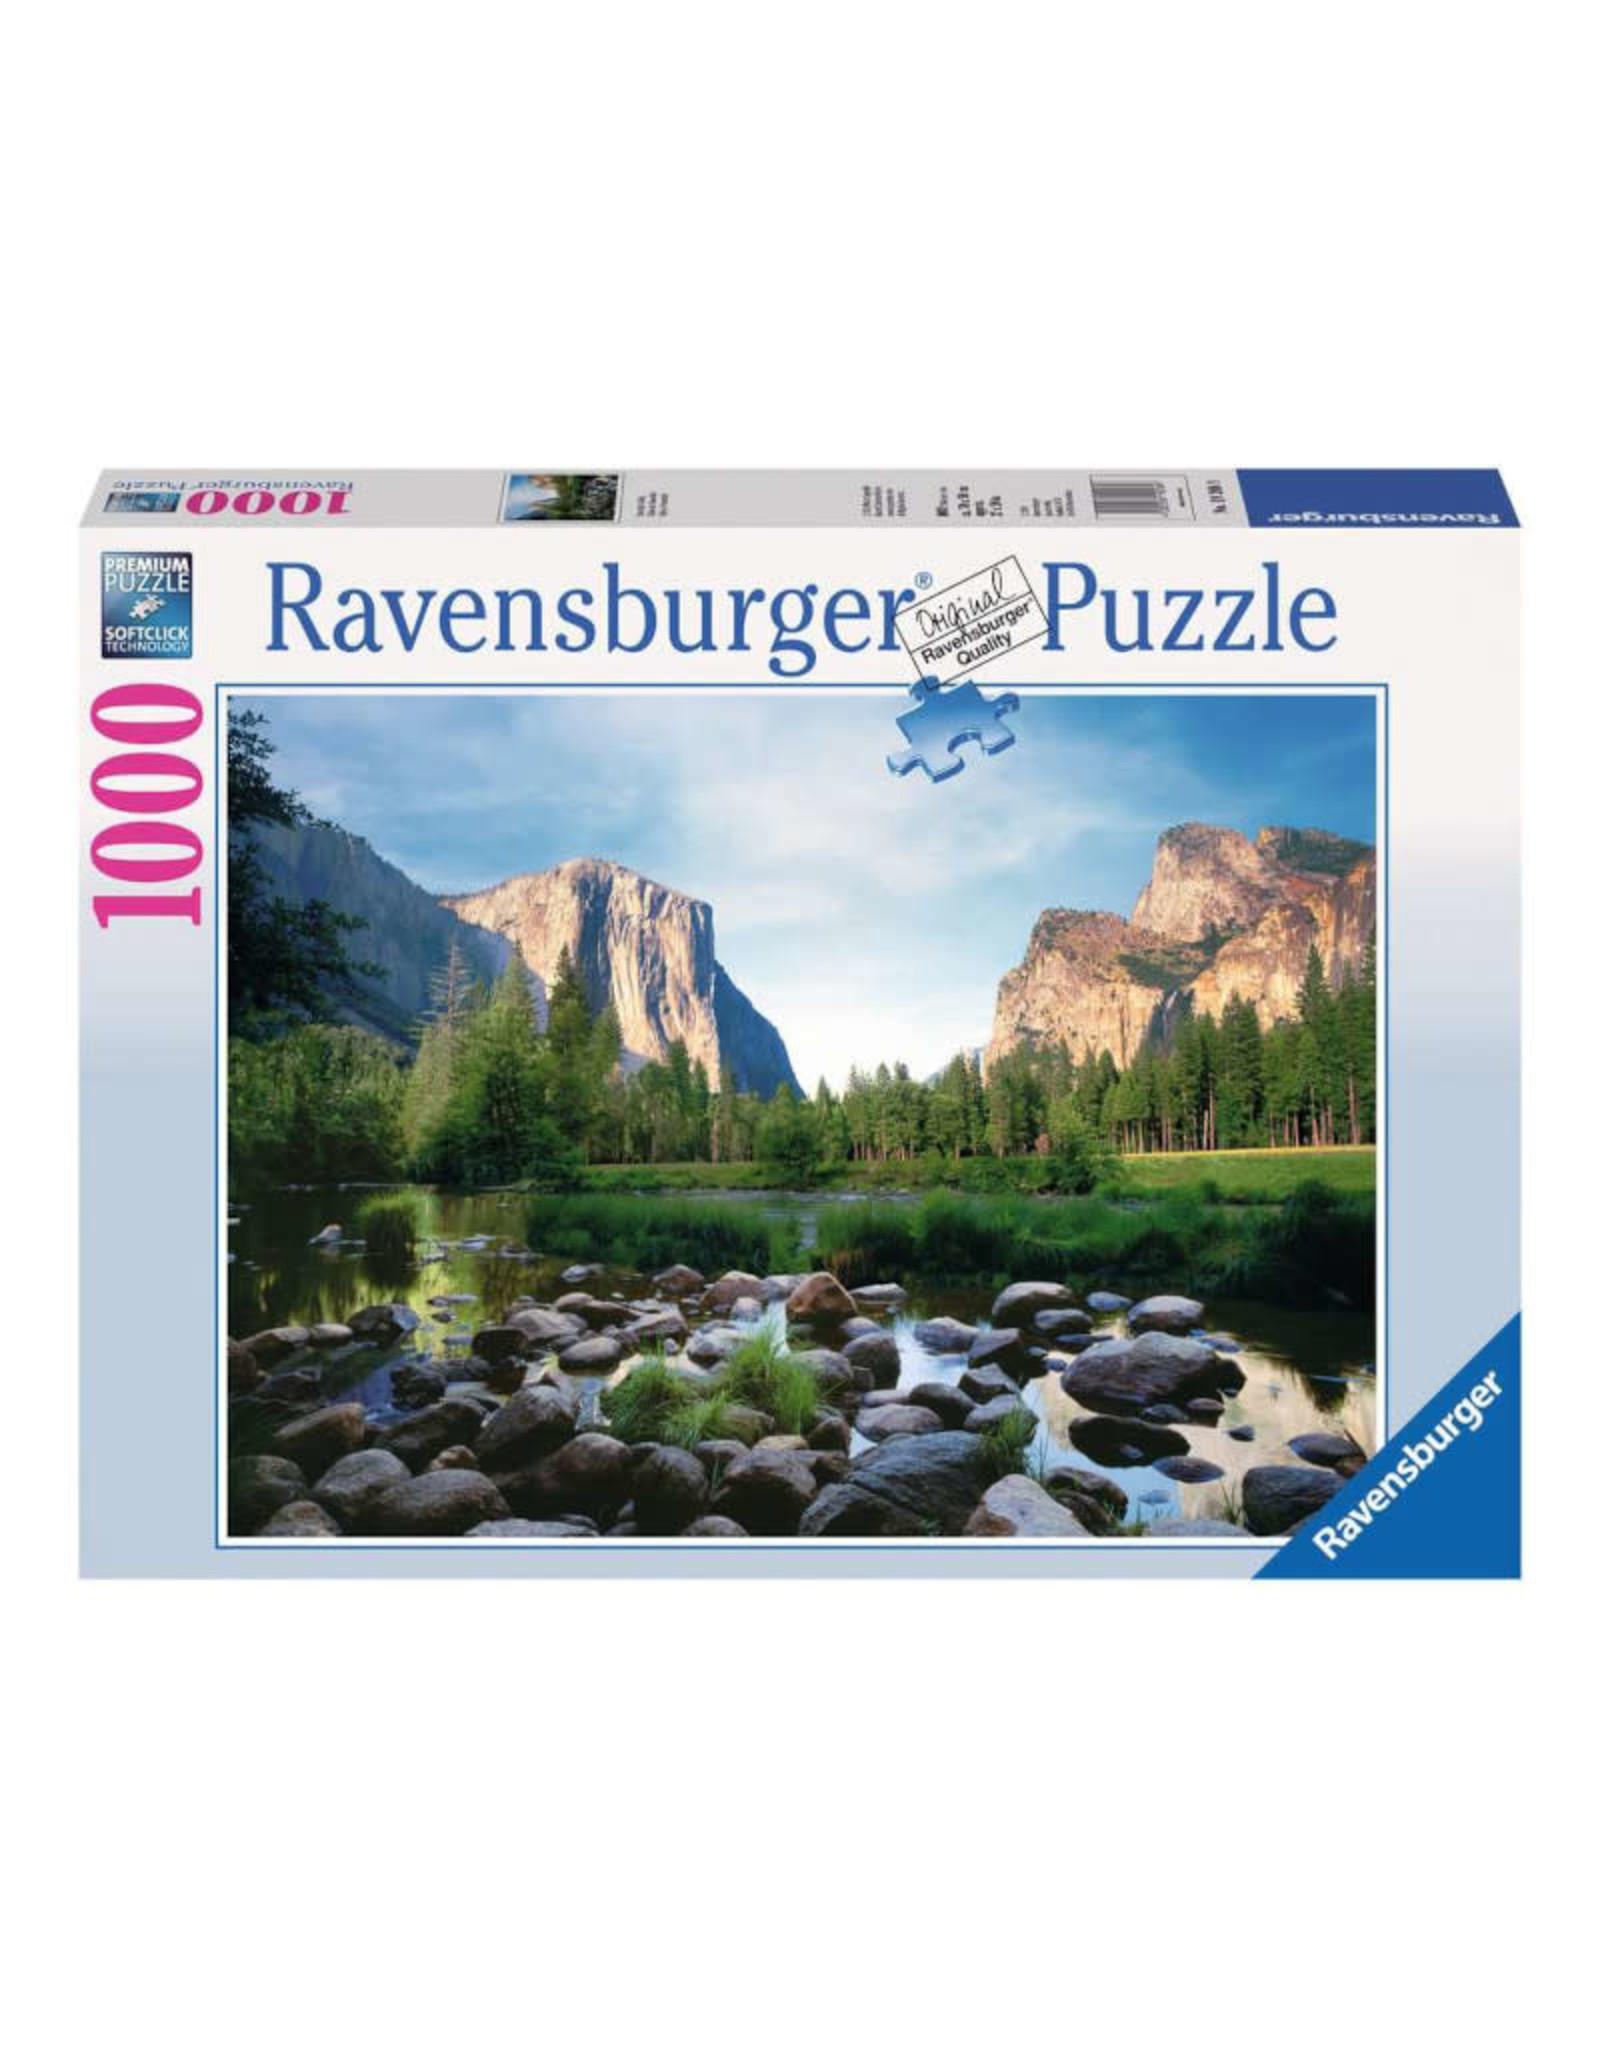 Ravensburger Yosemite Valley Puzzle 1000 PCS